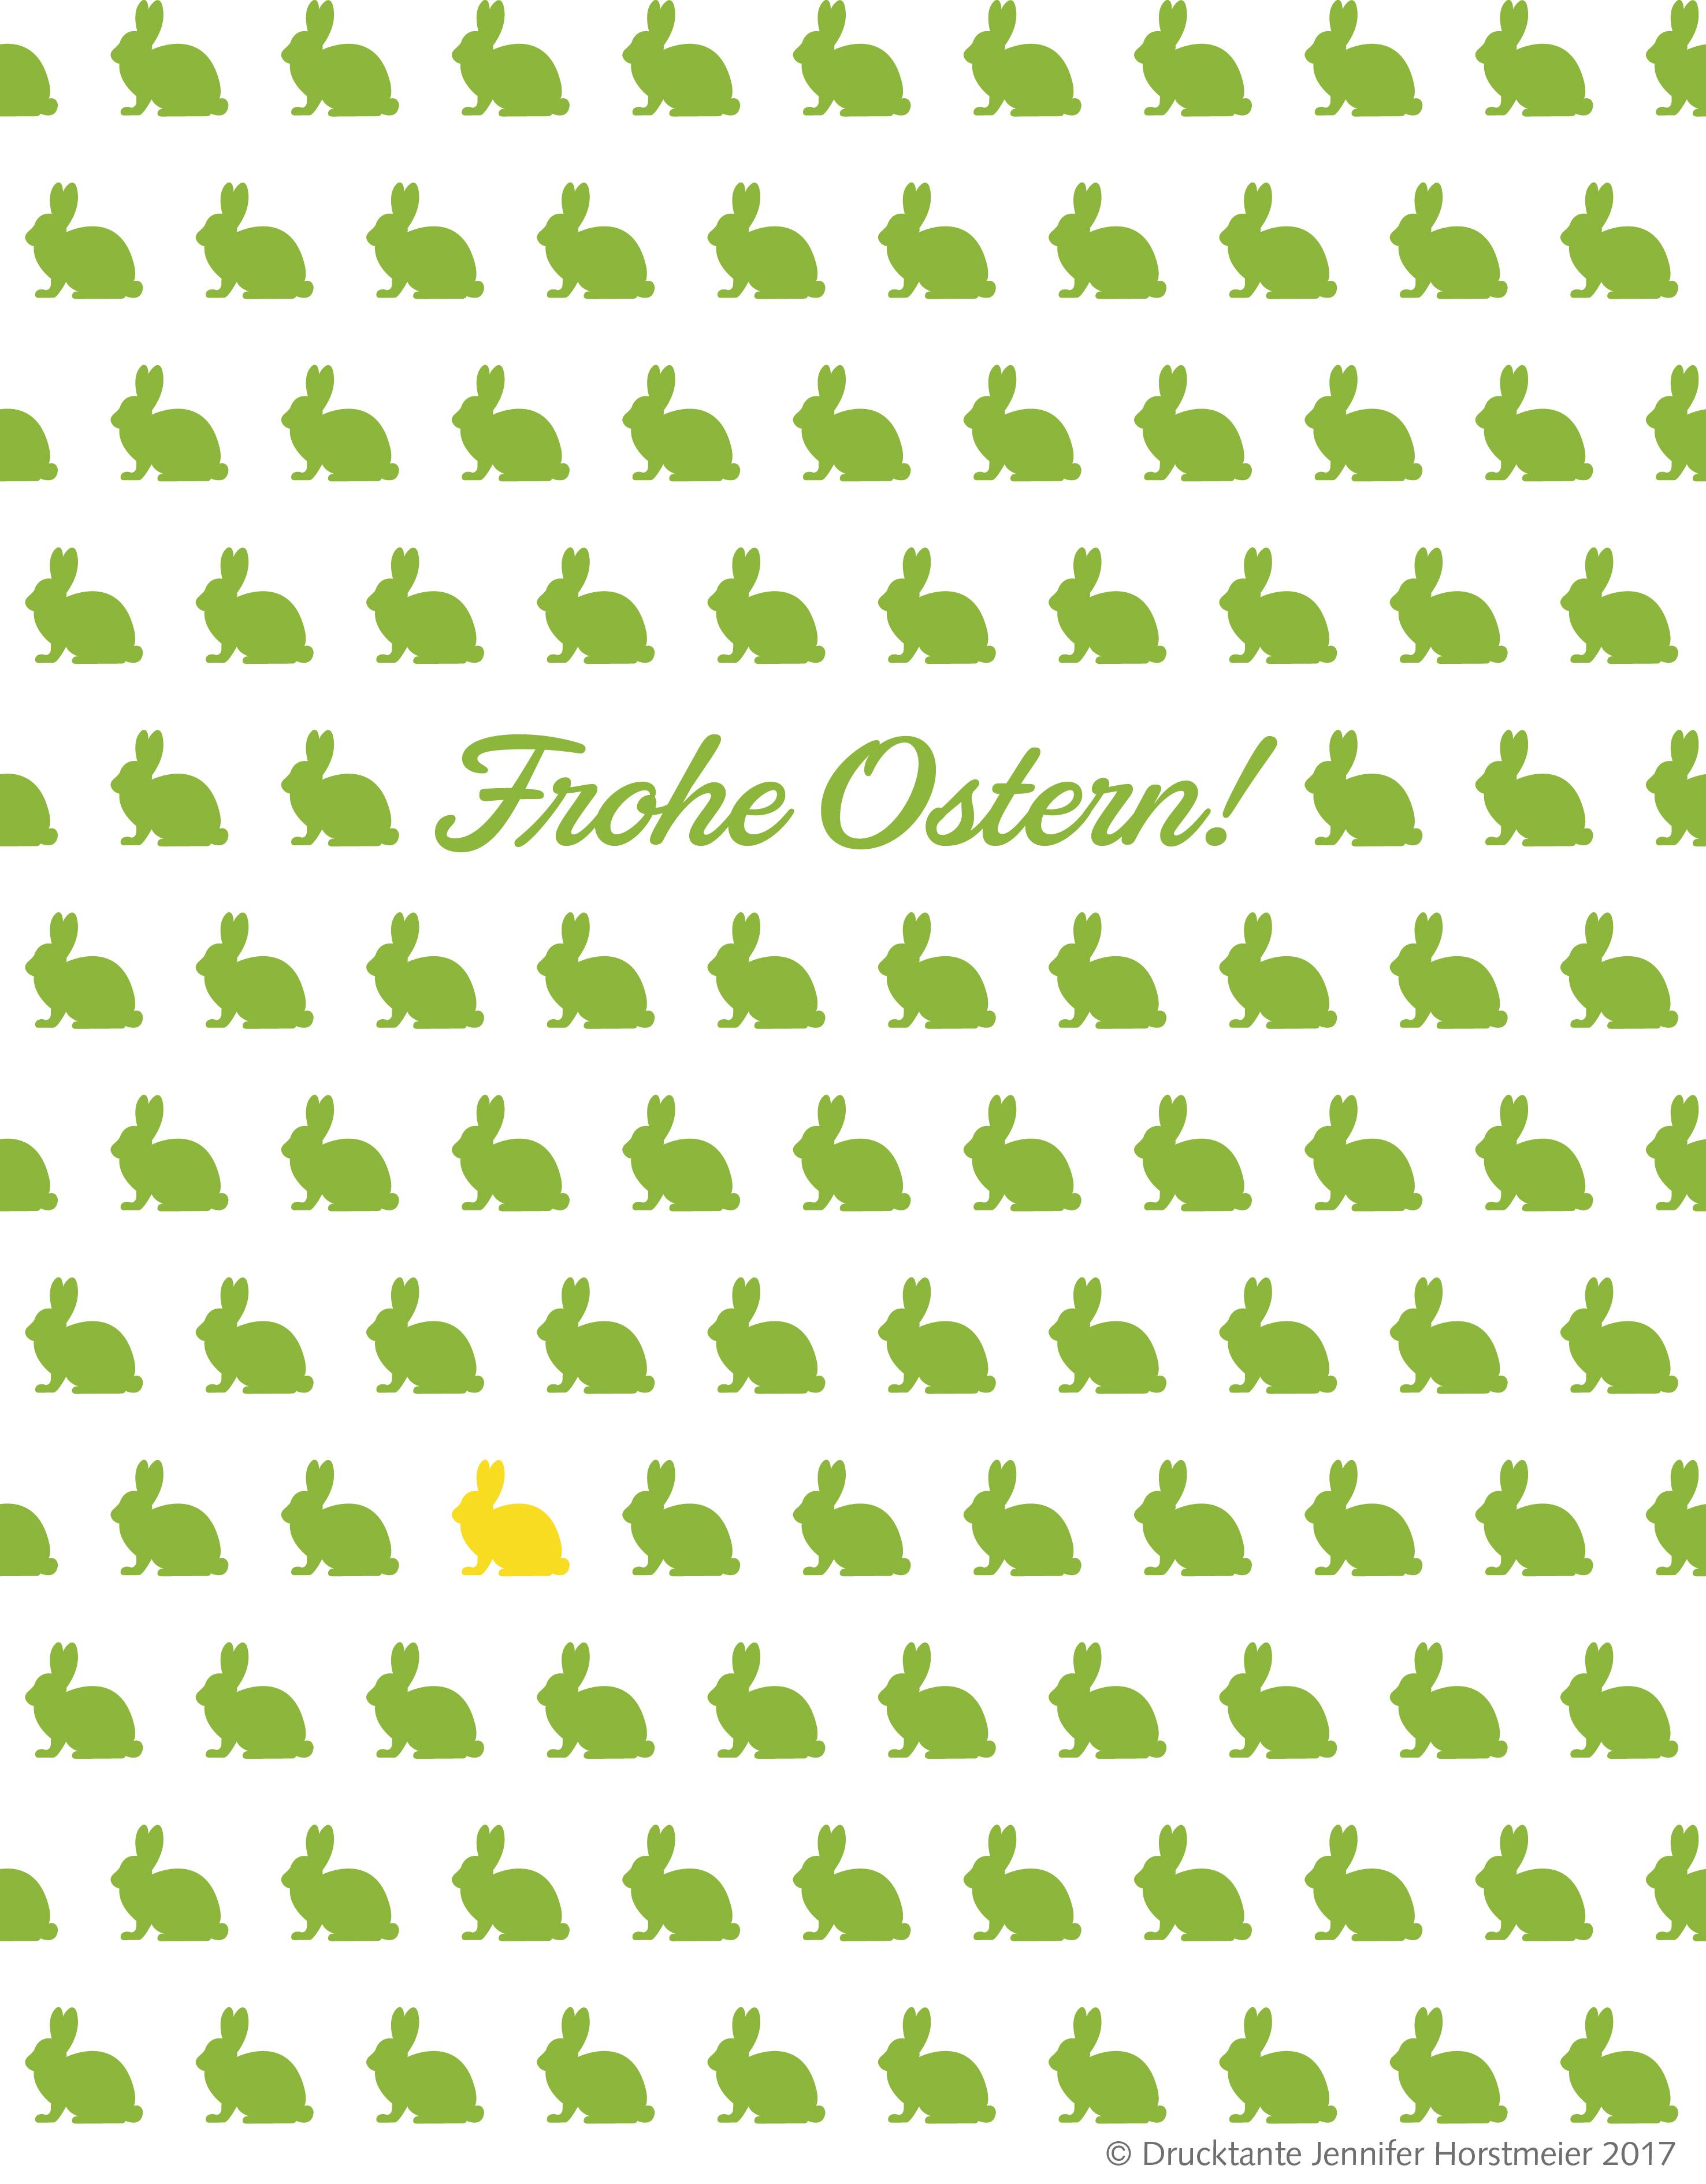 hasen_post_ostern-01